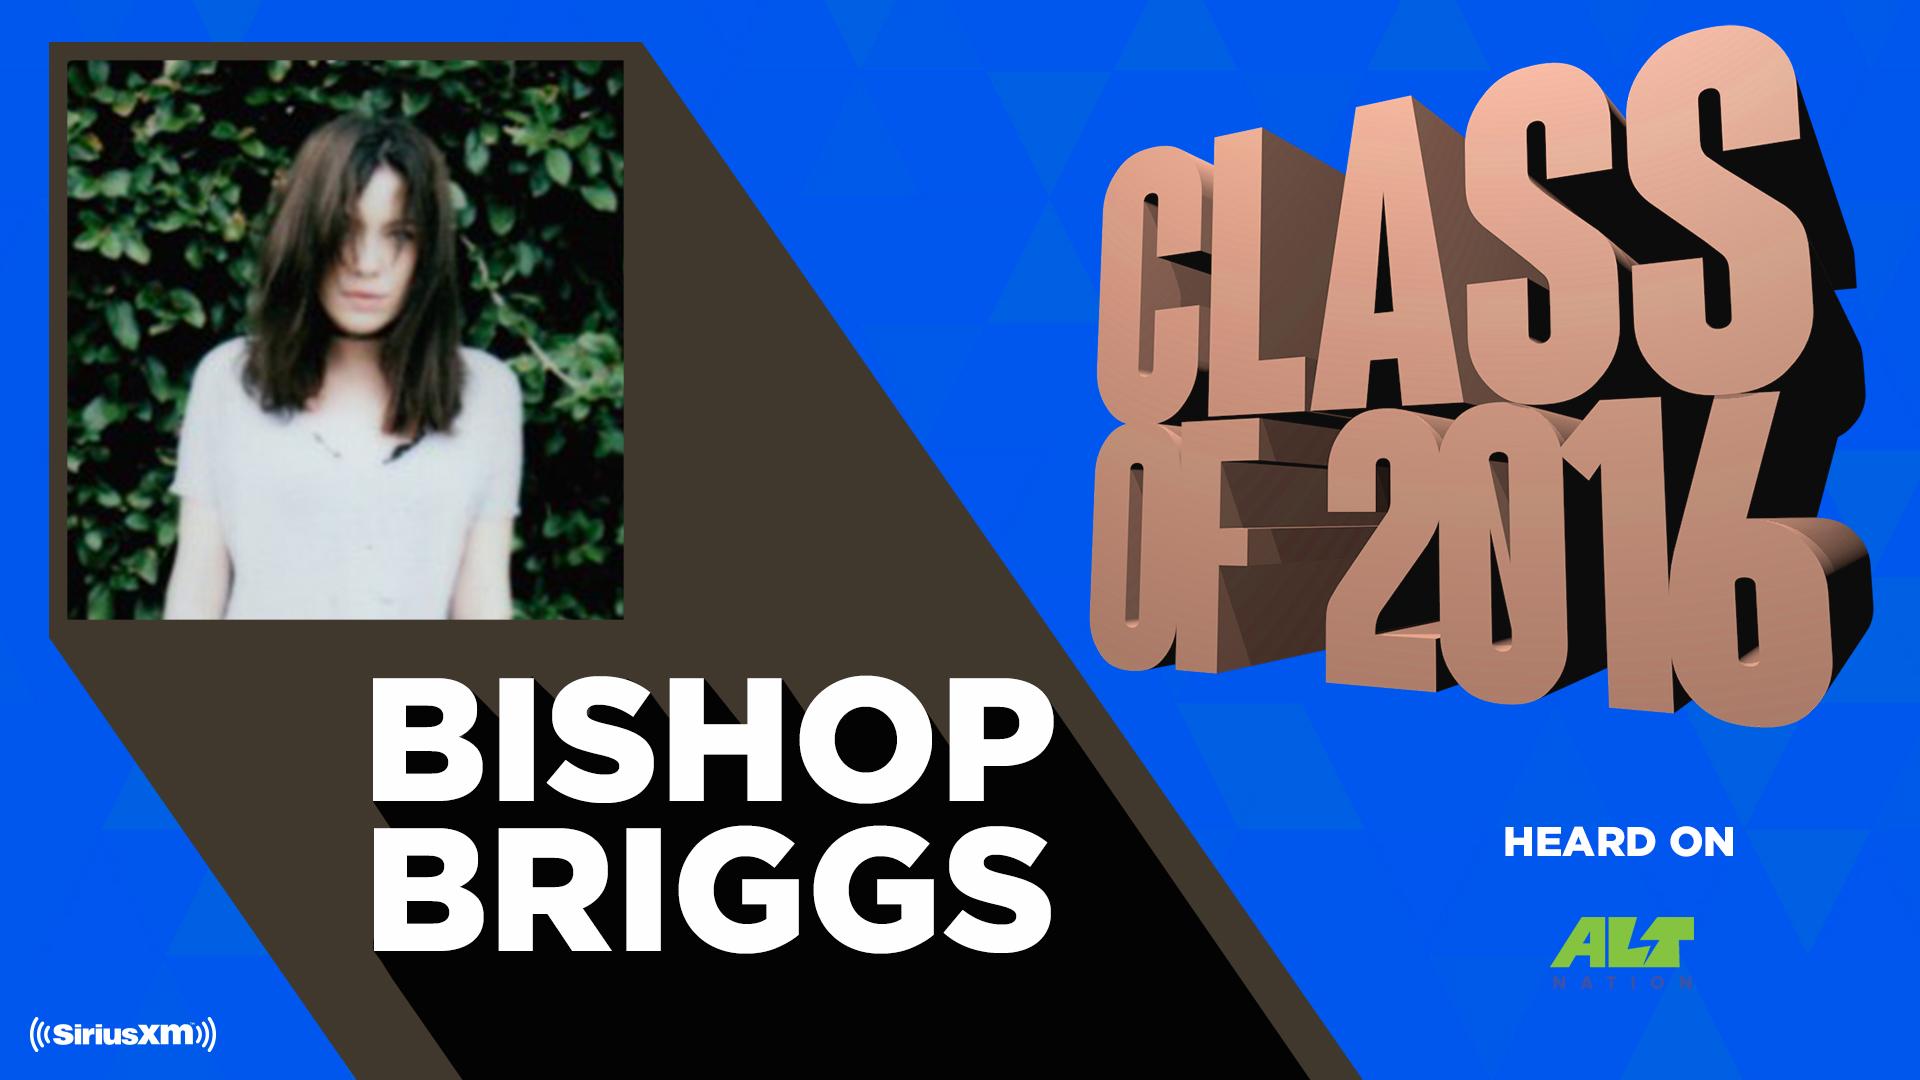 bishopbriggs_co16